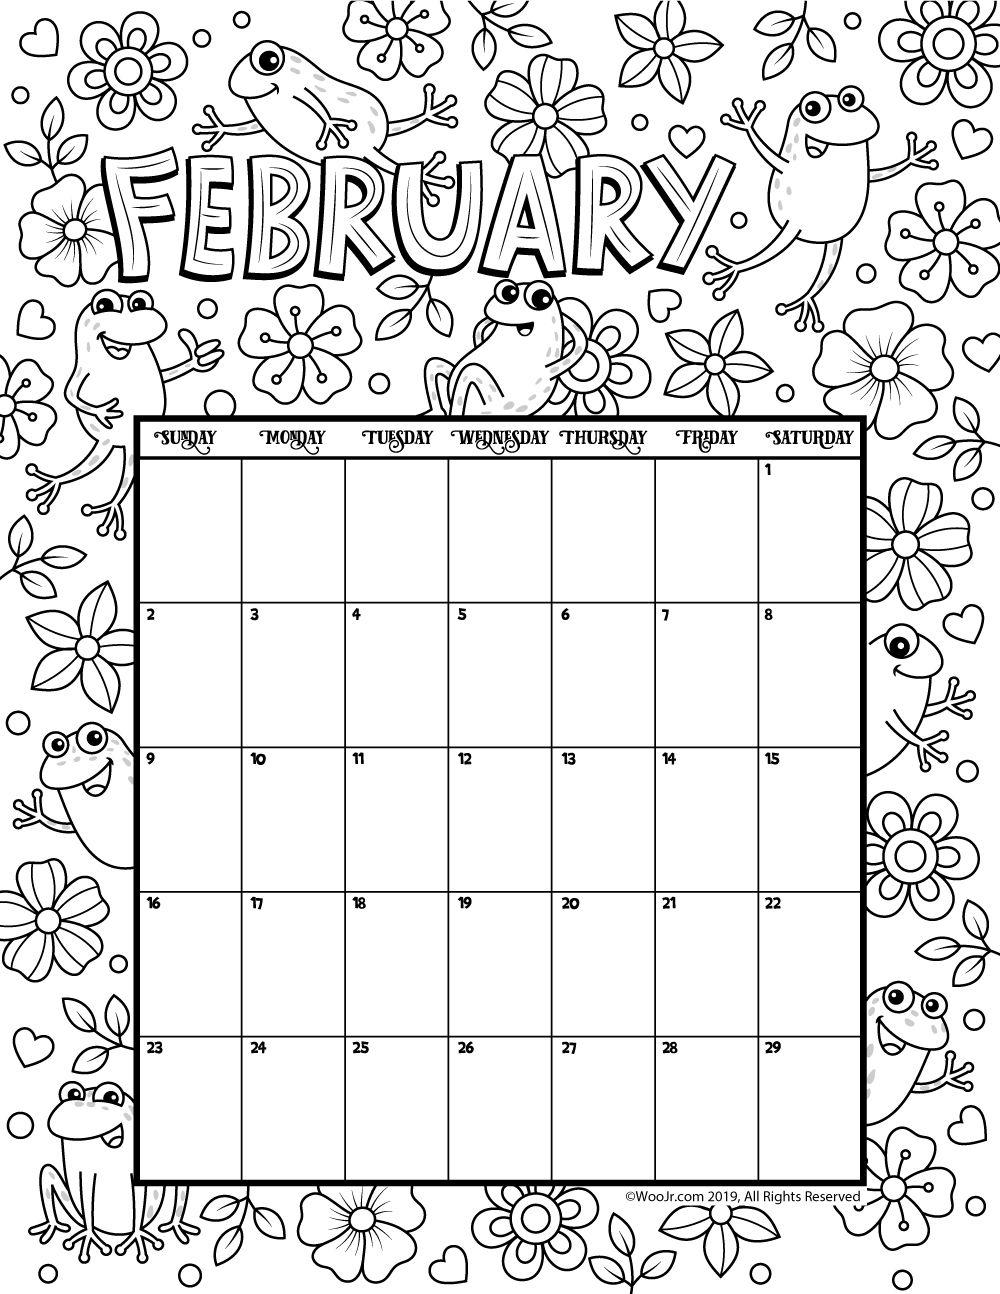 February 2020 Coloring Calendar Woo Jr Kids Activities Coloring Calendar Kids Calendar Calendar Craft